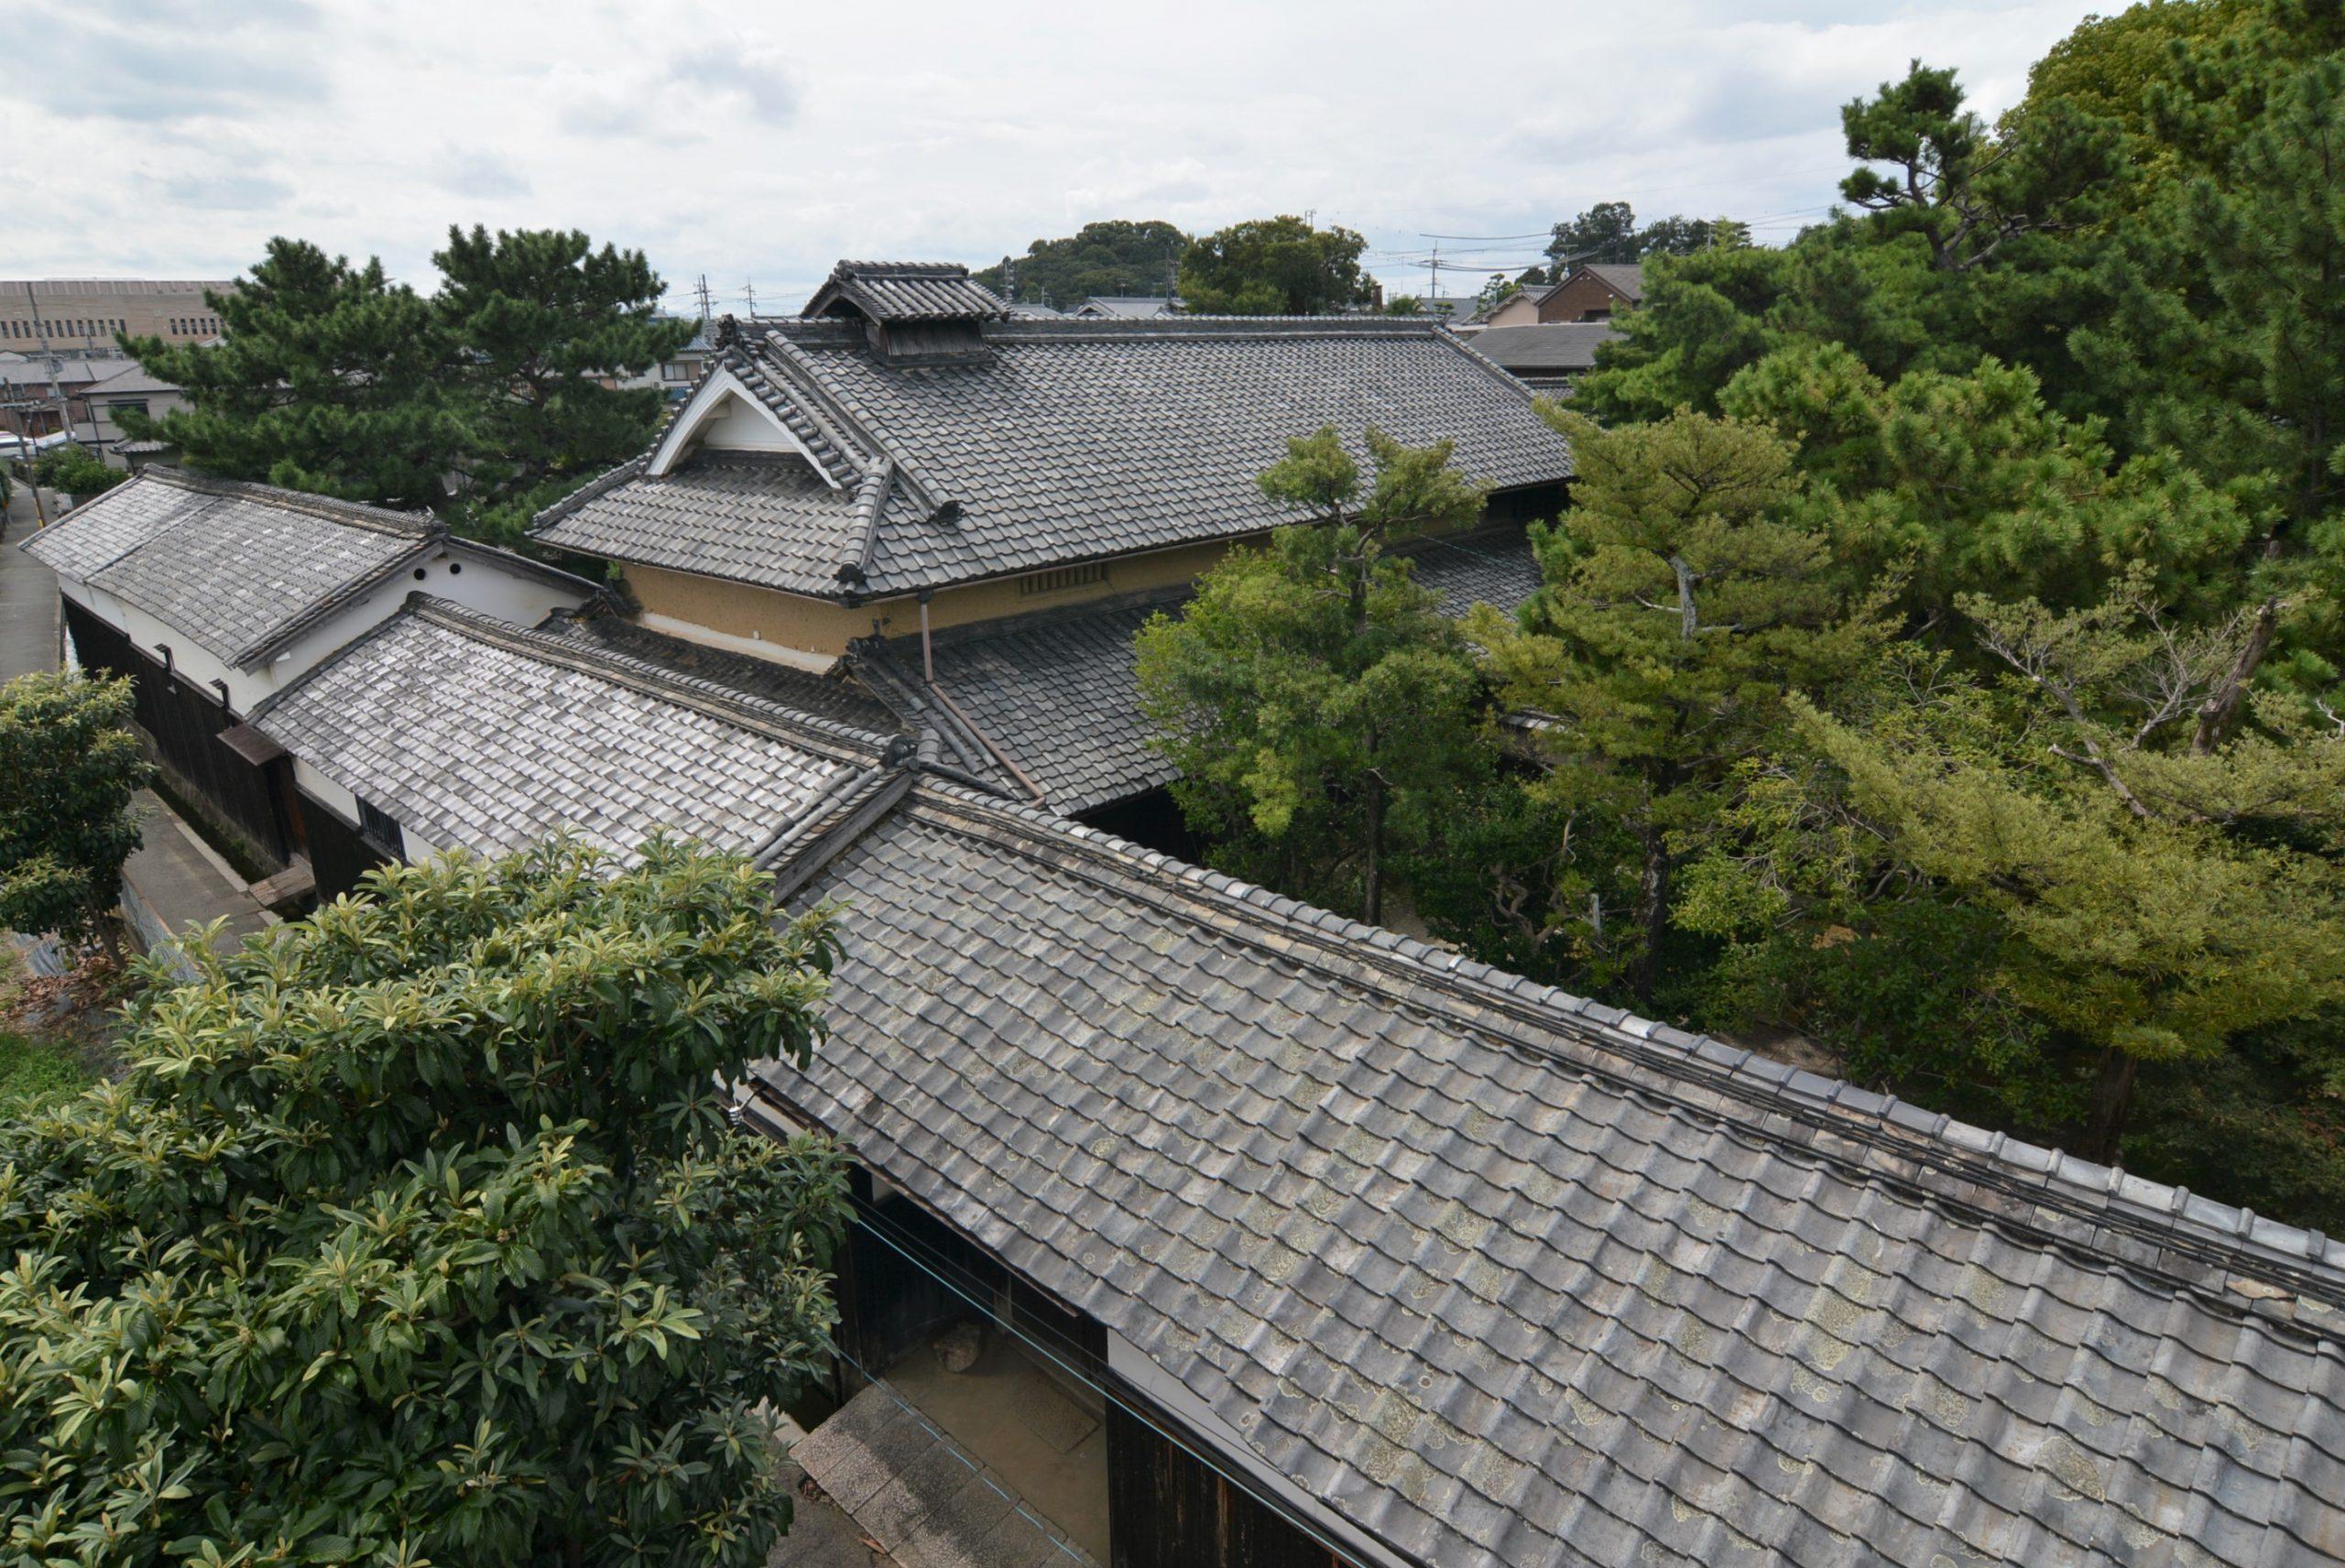 <p>広い庭は樹木に覆われる</p>玄関庭・主屋庭・主屋南側の作業庭・茶室前の露地等がある。主屋北側の座敷庭は回遊式の日本庭園である。